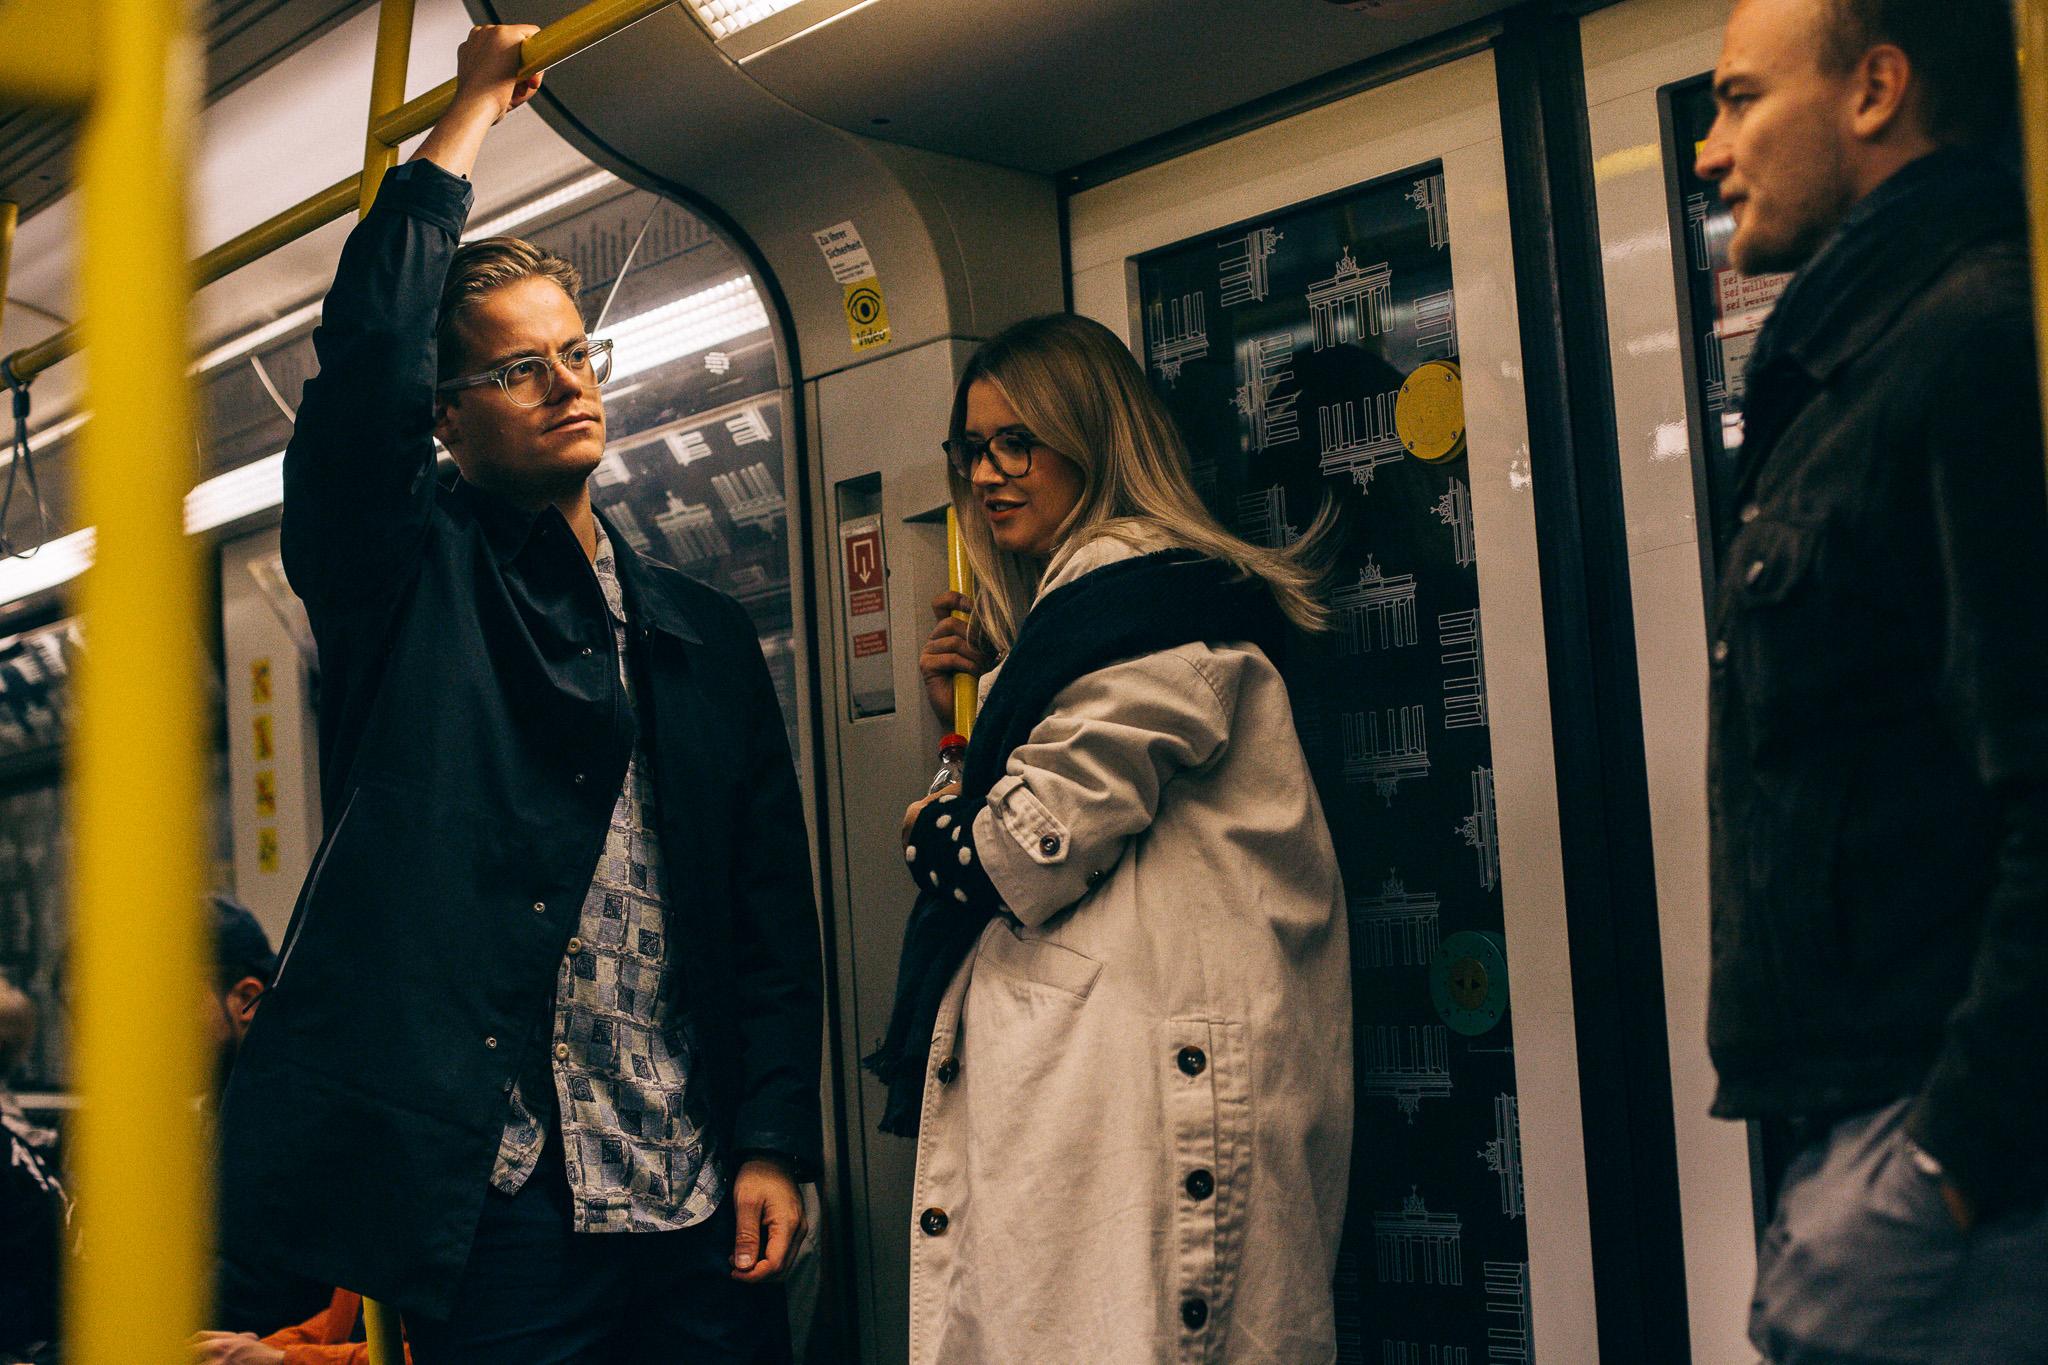 29.09.2018  Joep, Myrthe, Angus on the U-Bahn.